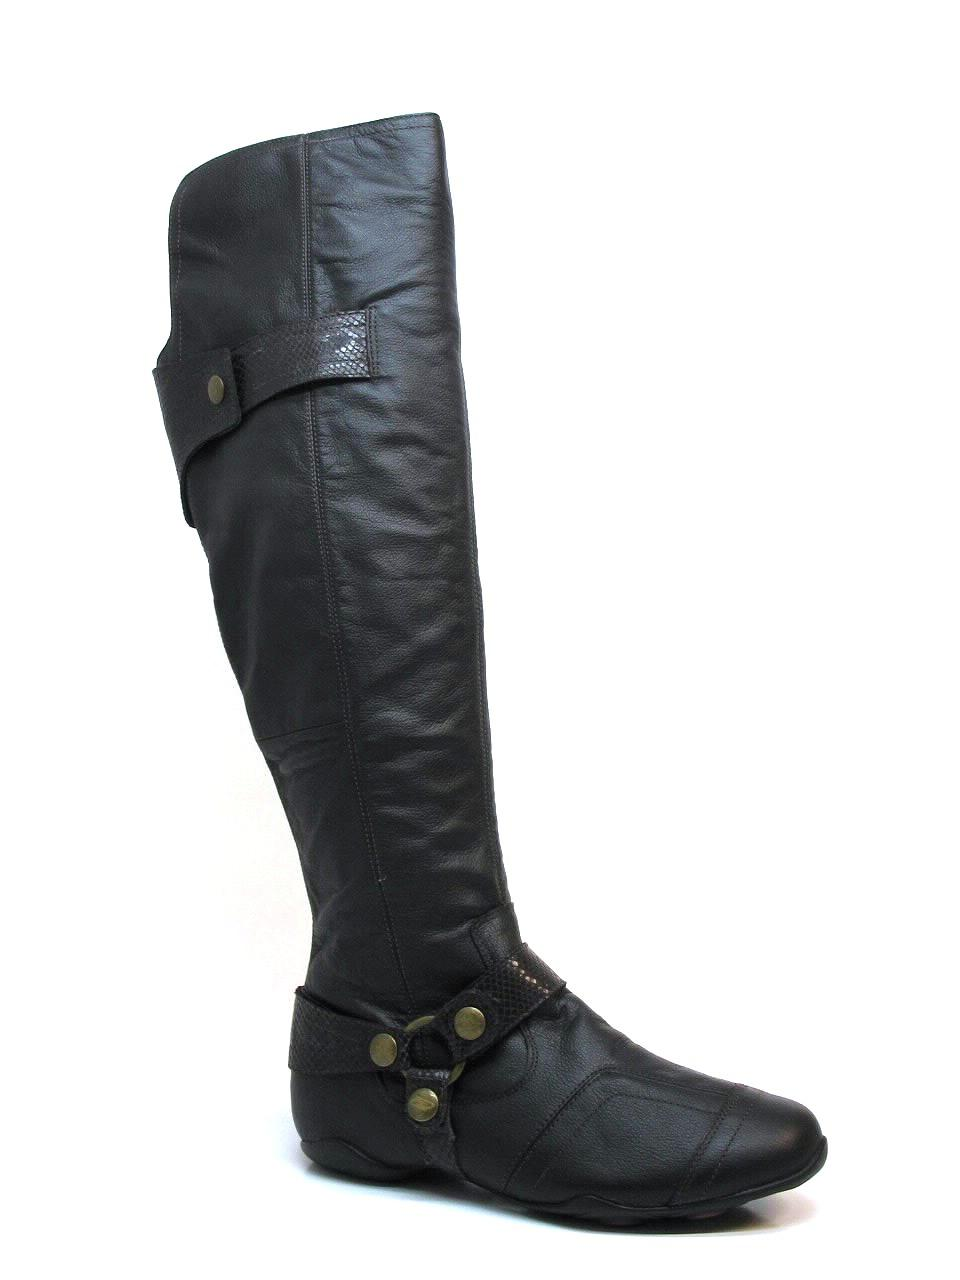 Botas Baixas DKNY - 35223390926